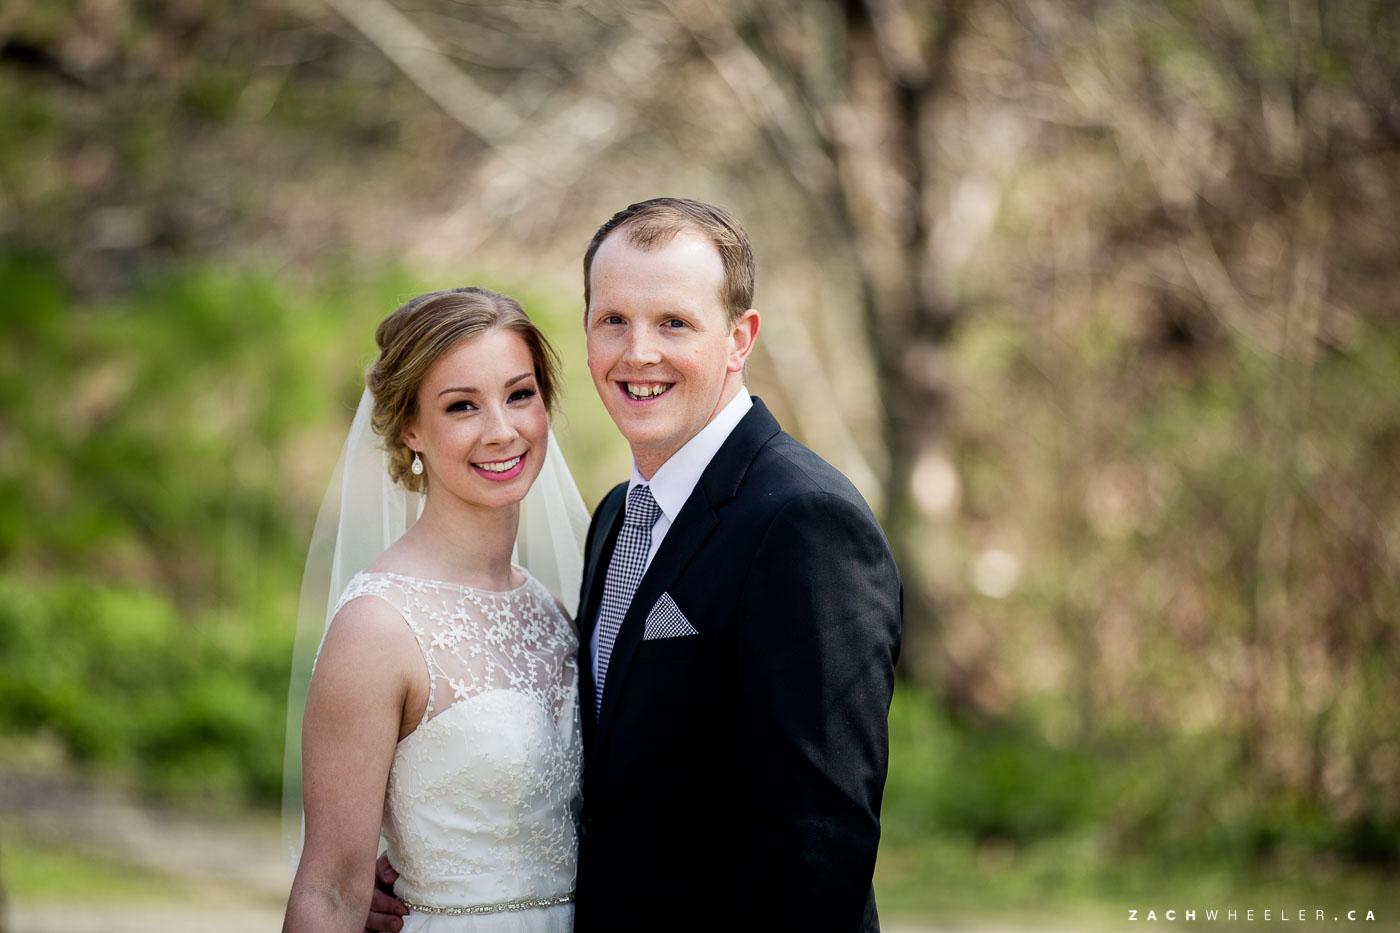 Sarah-Grant-Lesters-Fram-Wedding-40